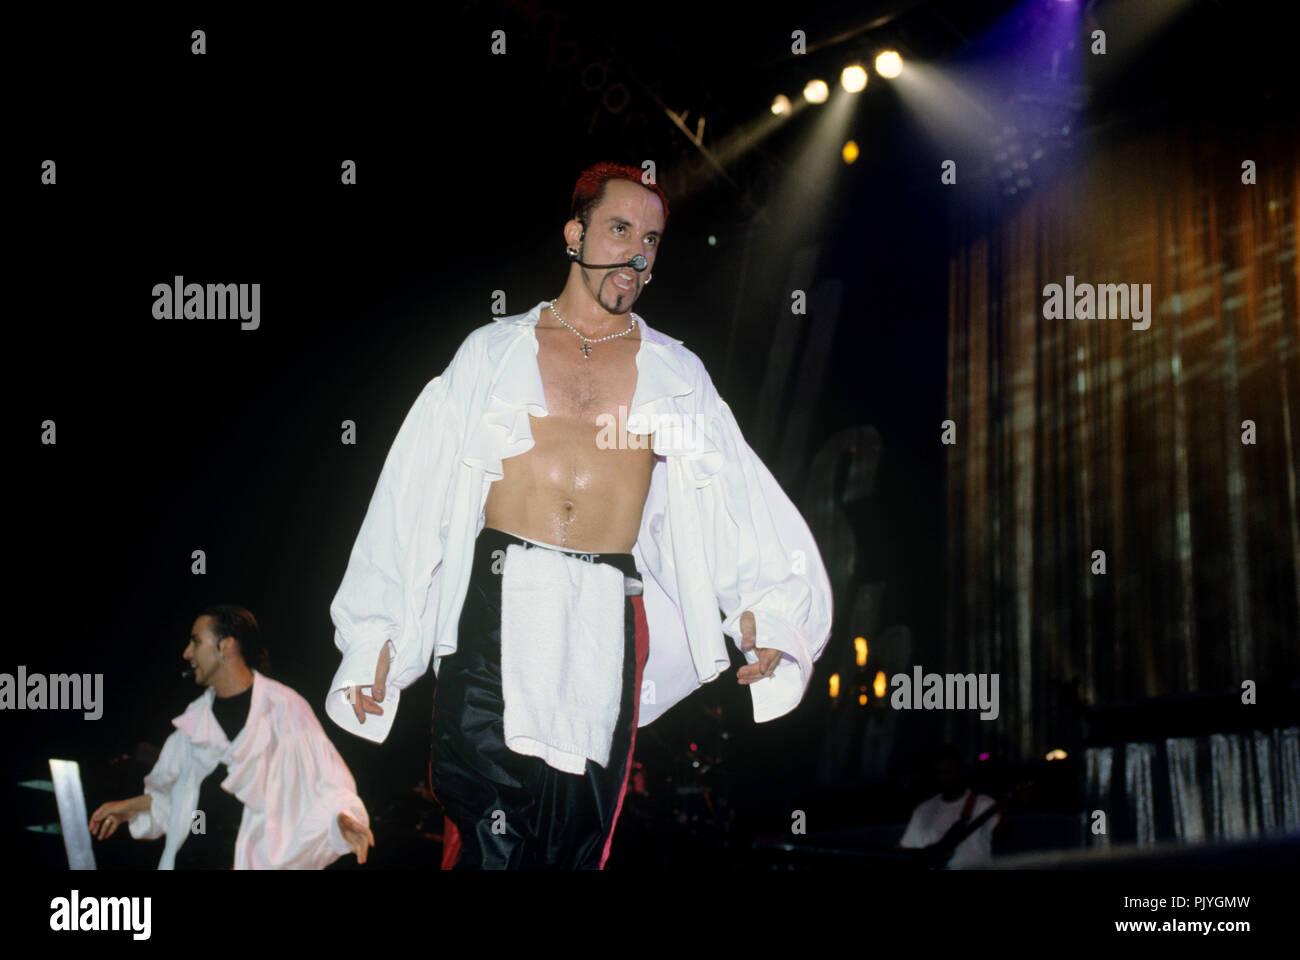 Alexander James McLean (Backstreet Boys) on 15.07.1998 in Washington. | usage worldwide - Stock Image